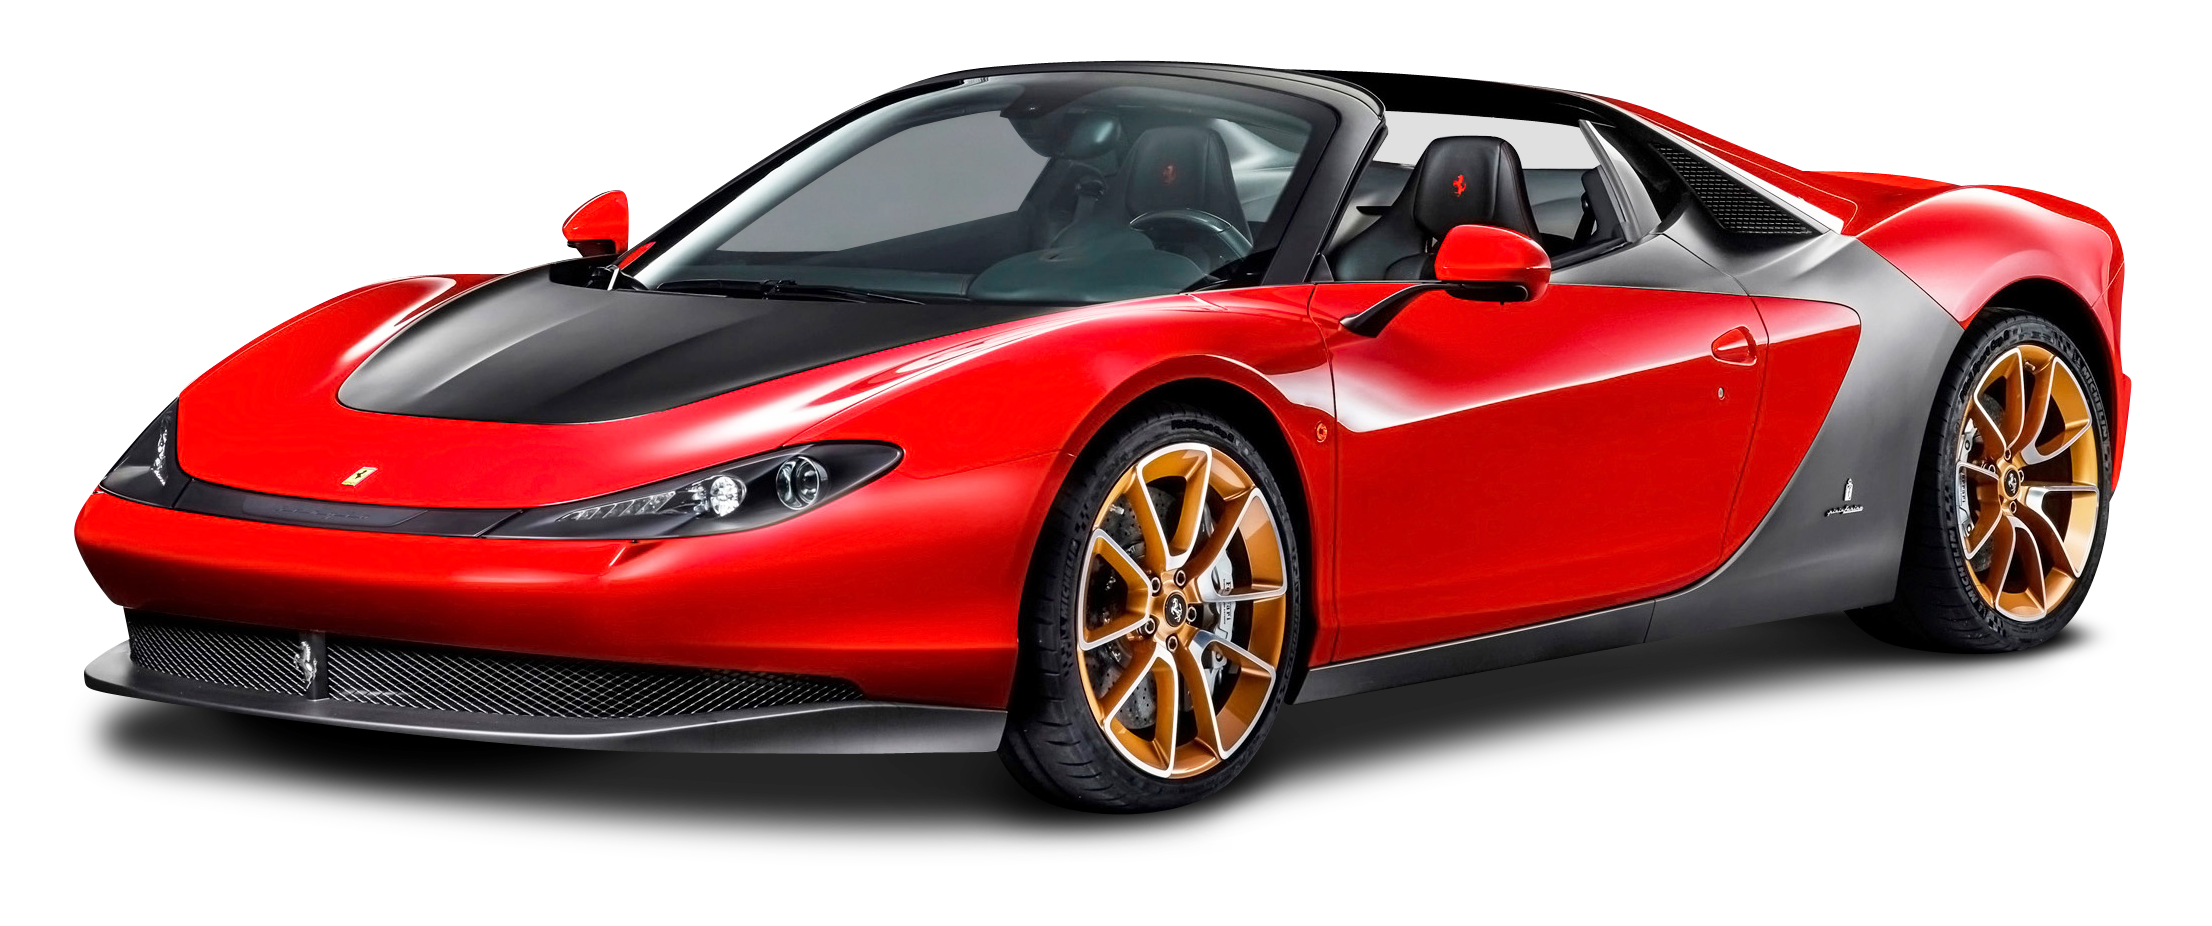 ferrari sergio red car png image purepng free. Black Bedroom Furniture Sets. Home Design Ideas